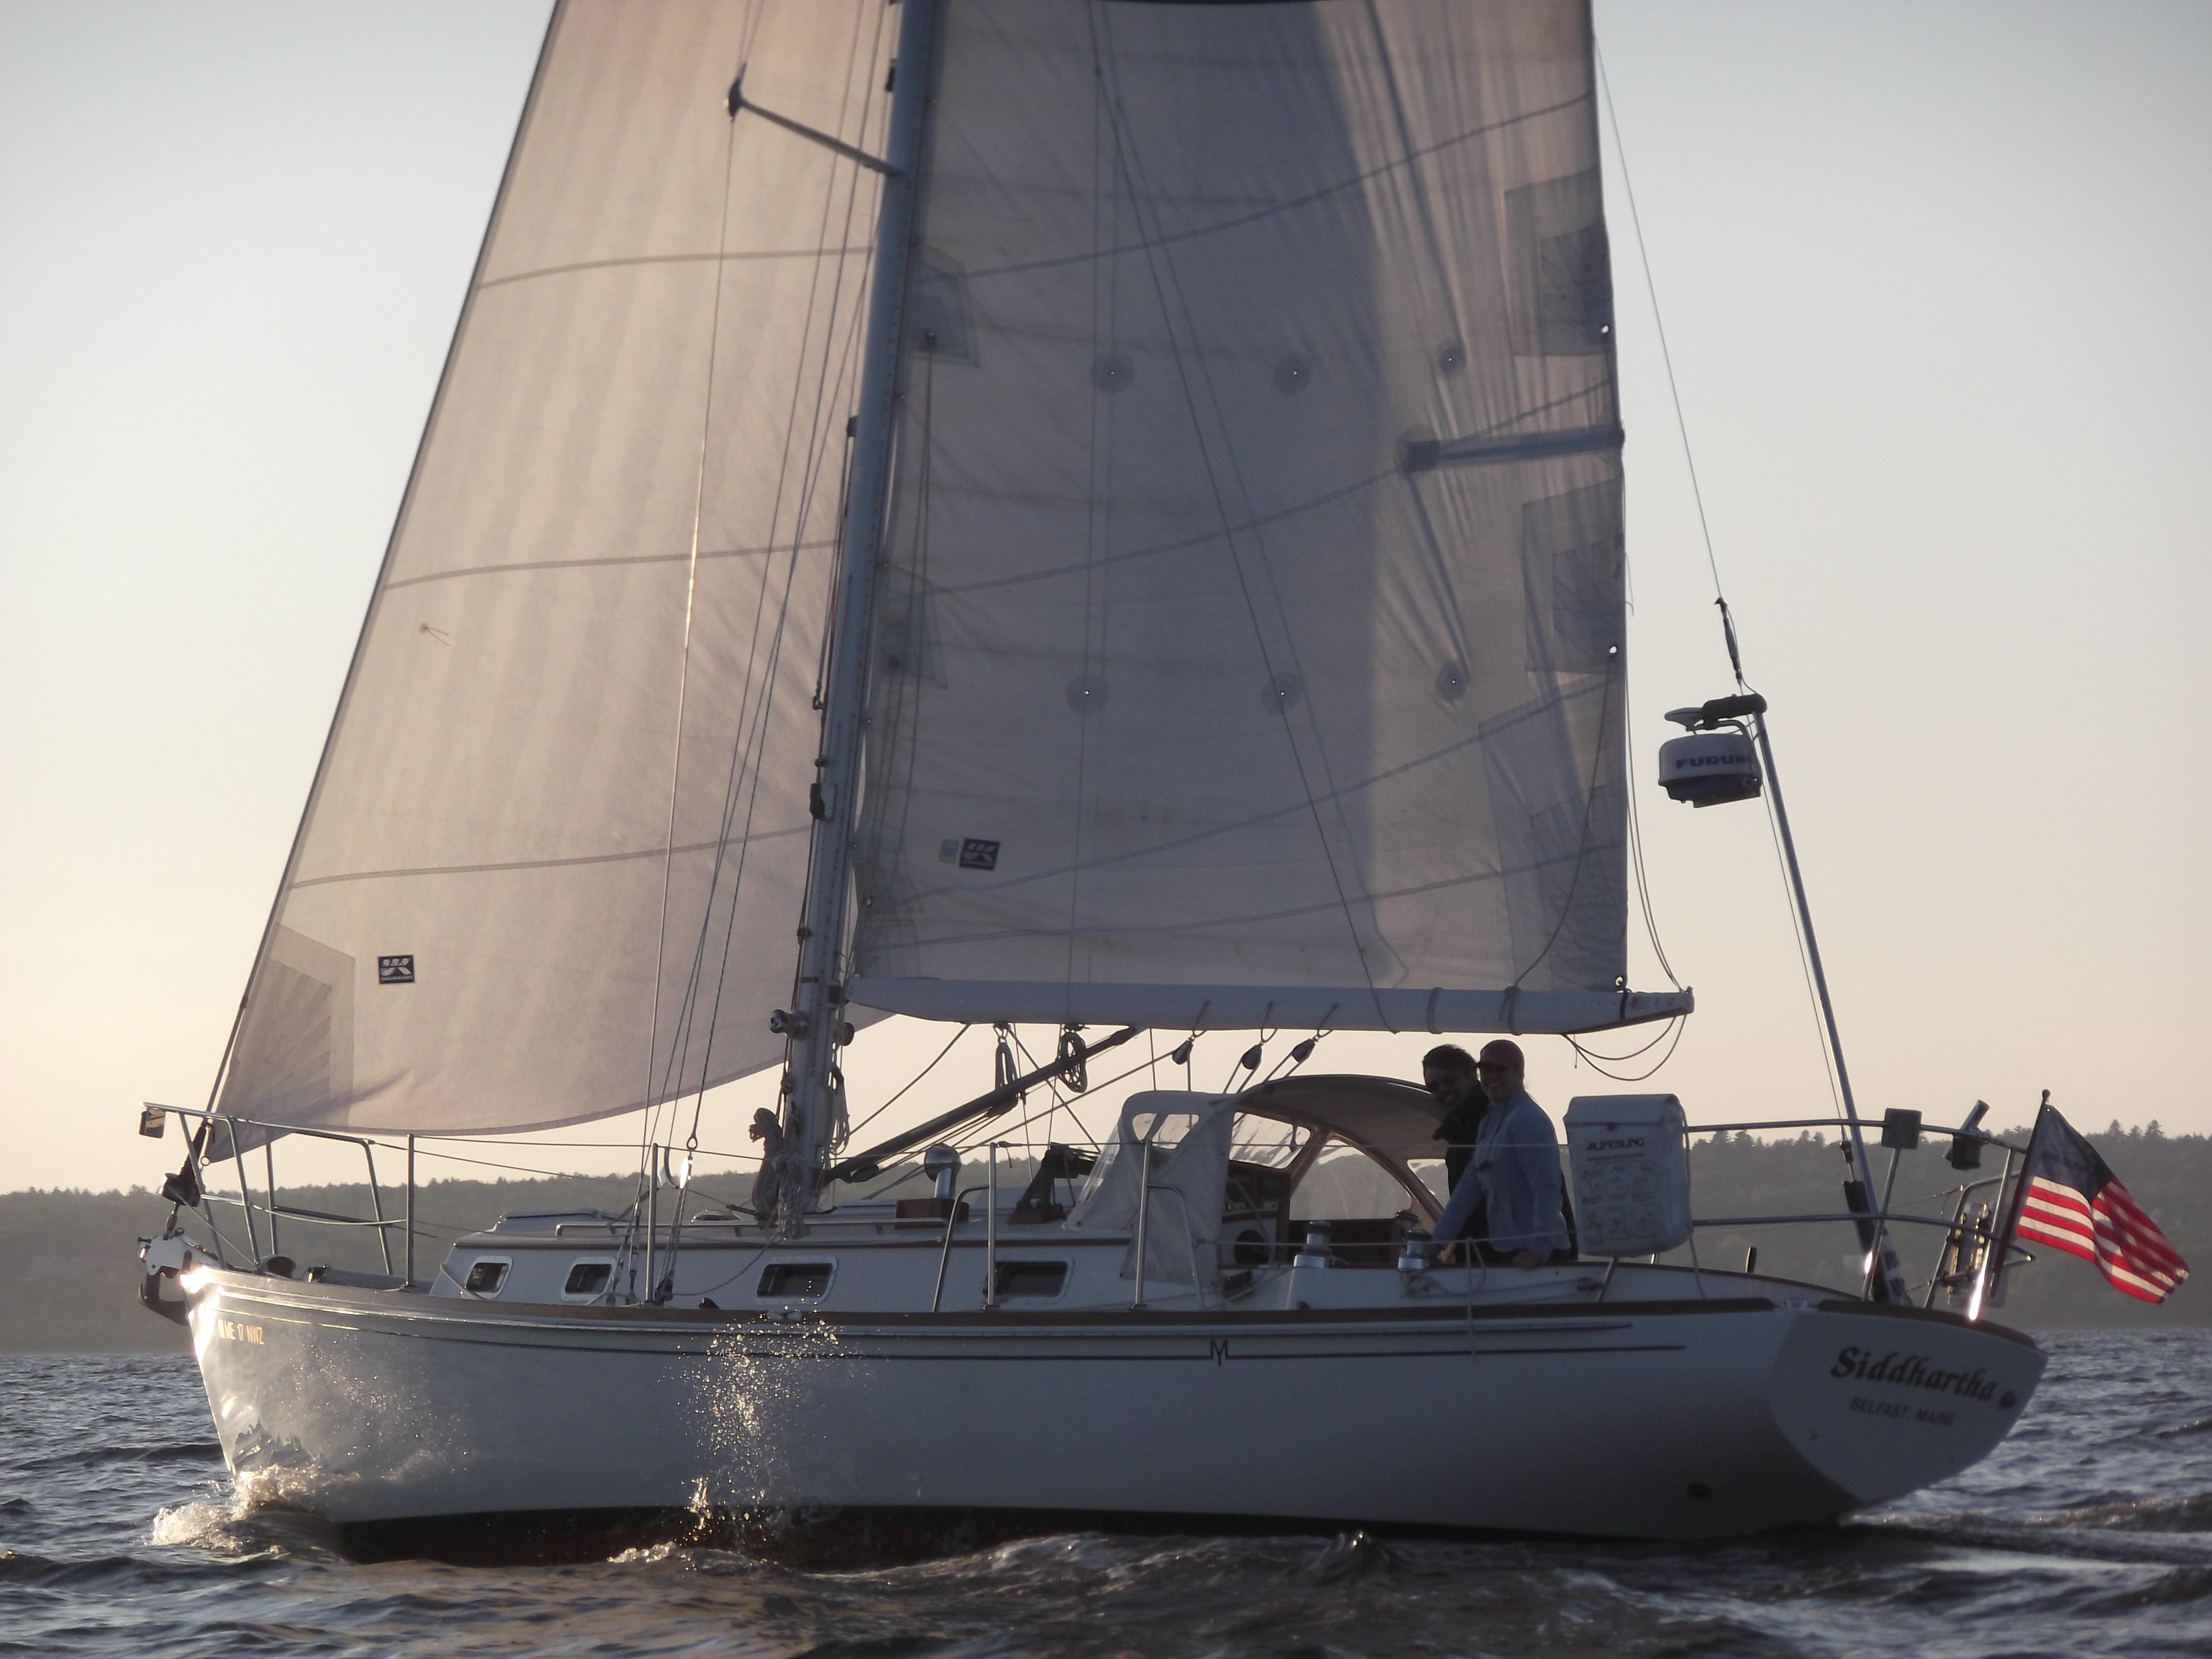 Morris Yachts Ocean Series 34, ME